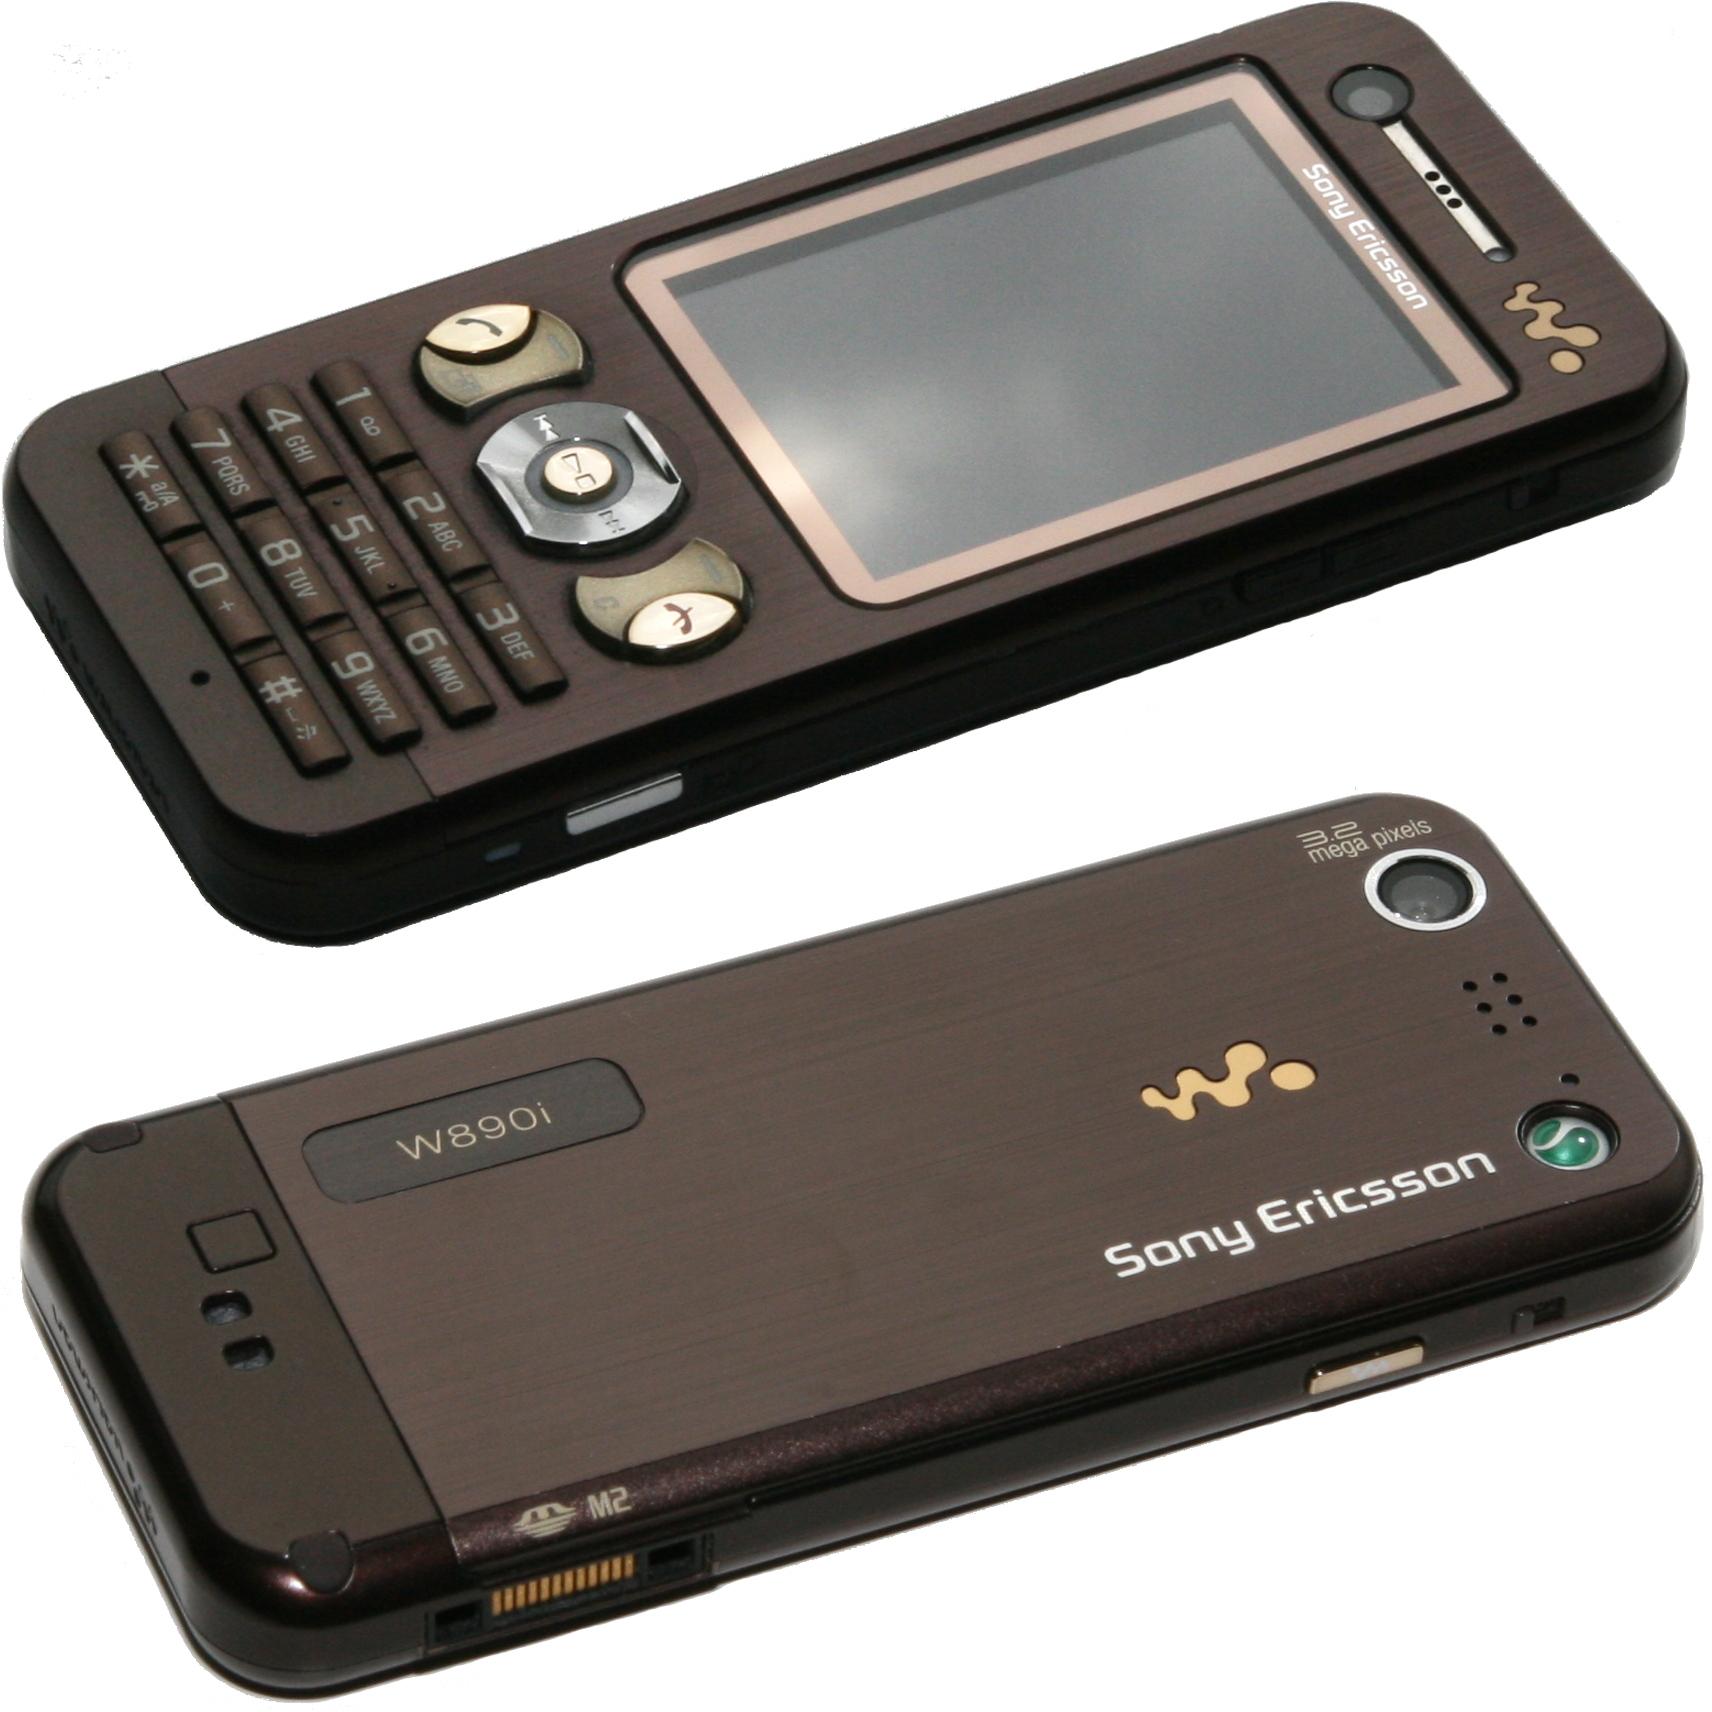 Sony b Ericsson /b W890i - b Википедия/b.